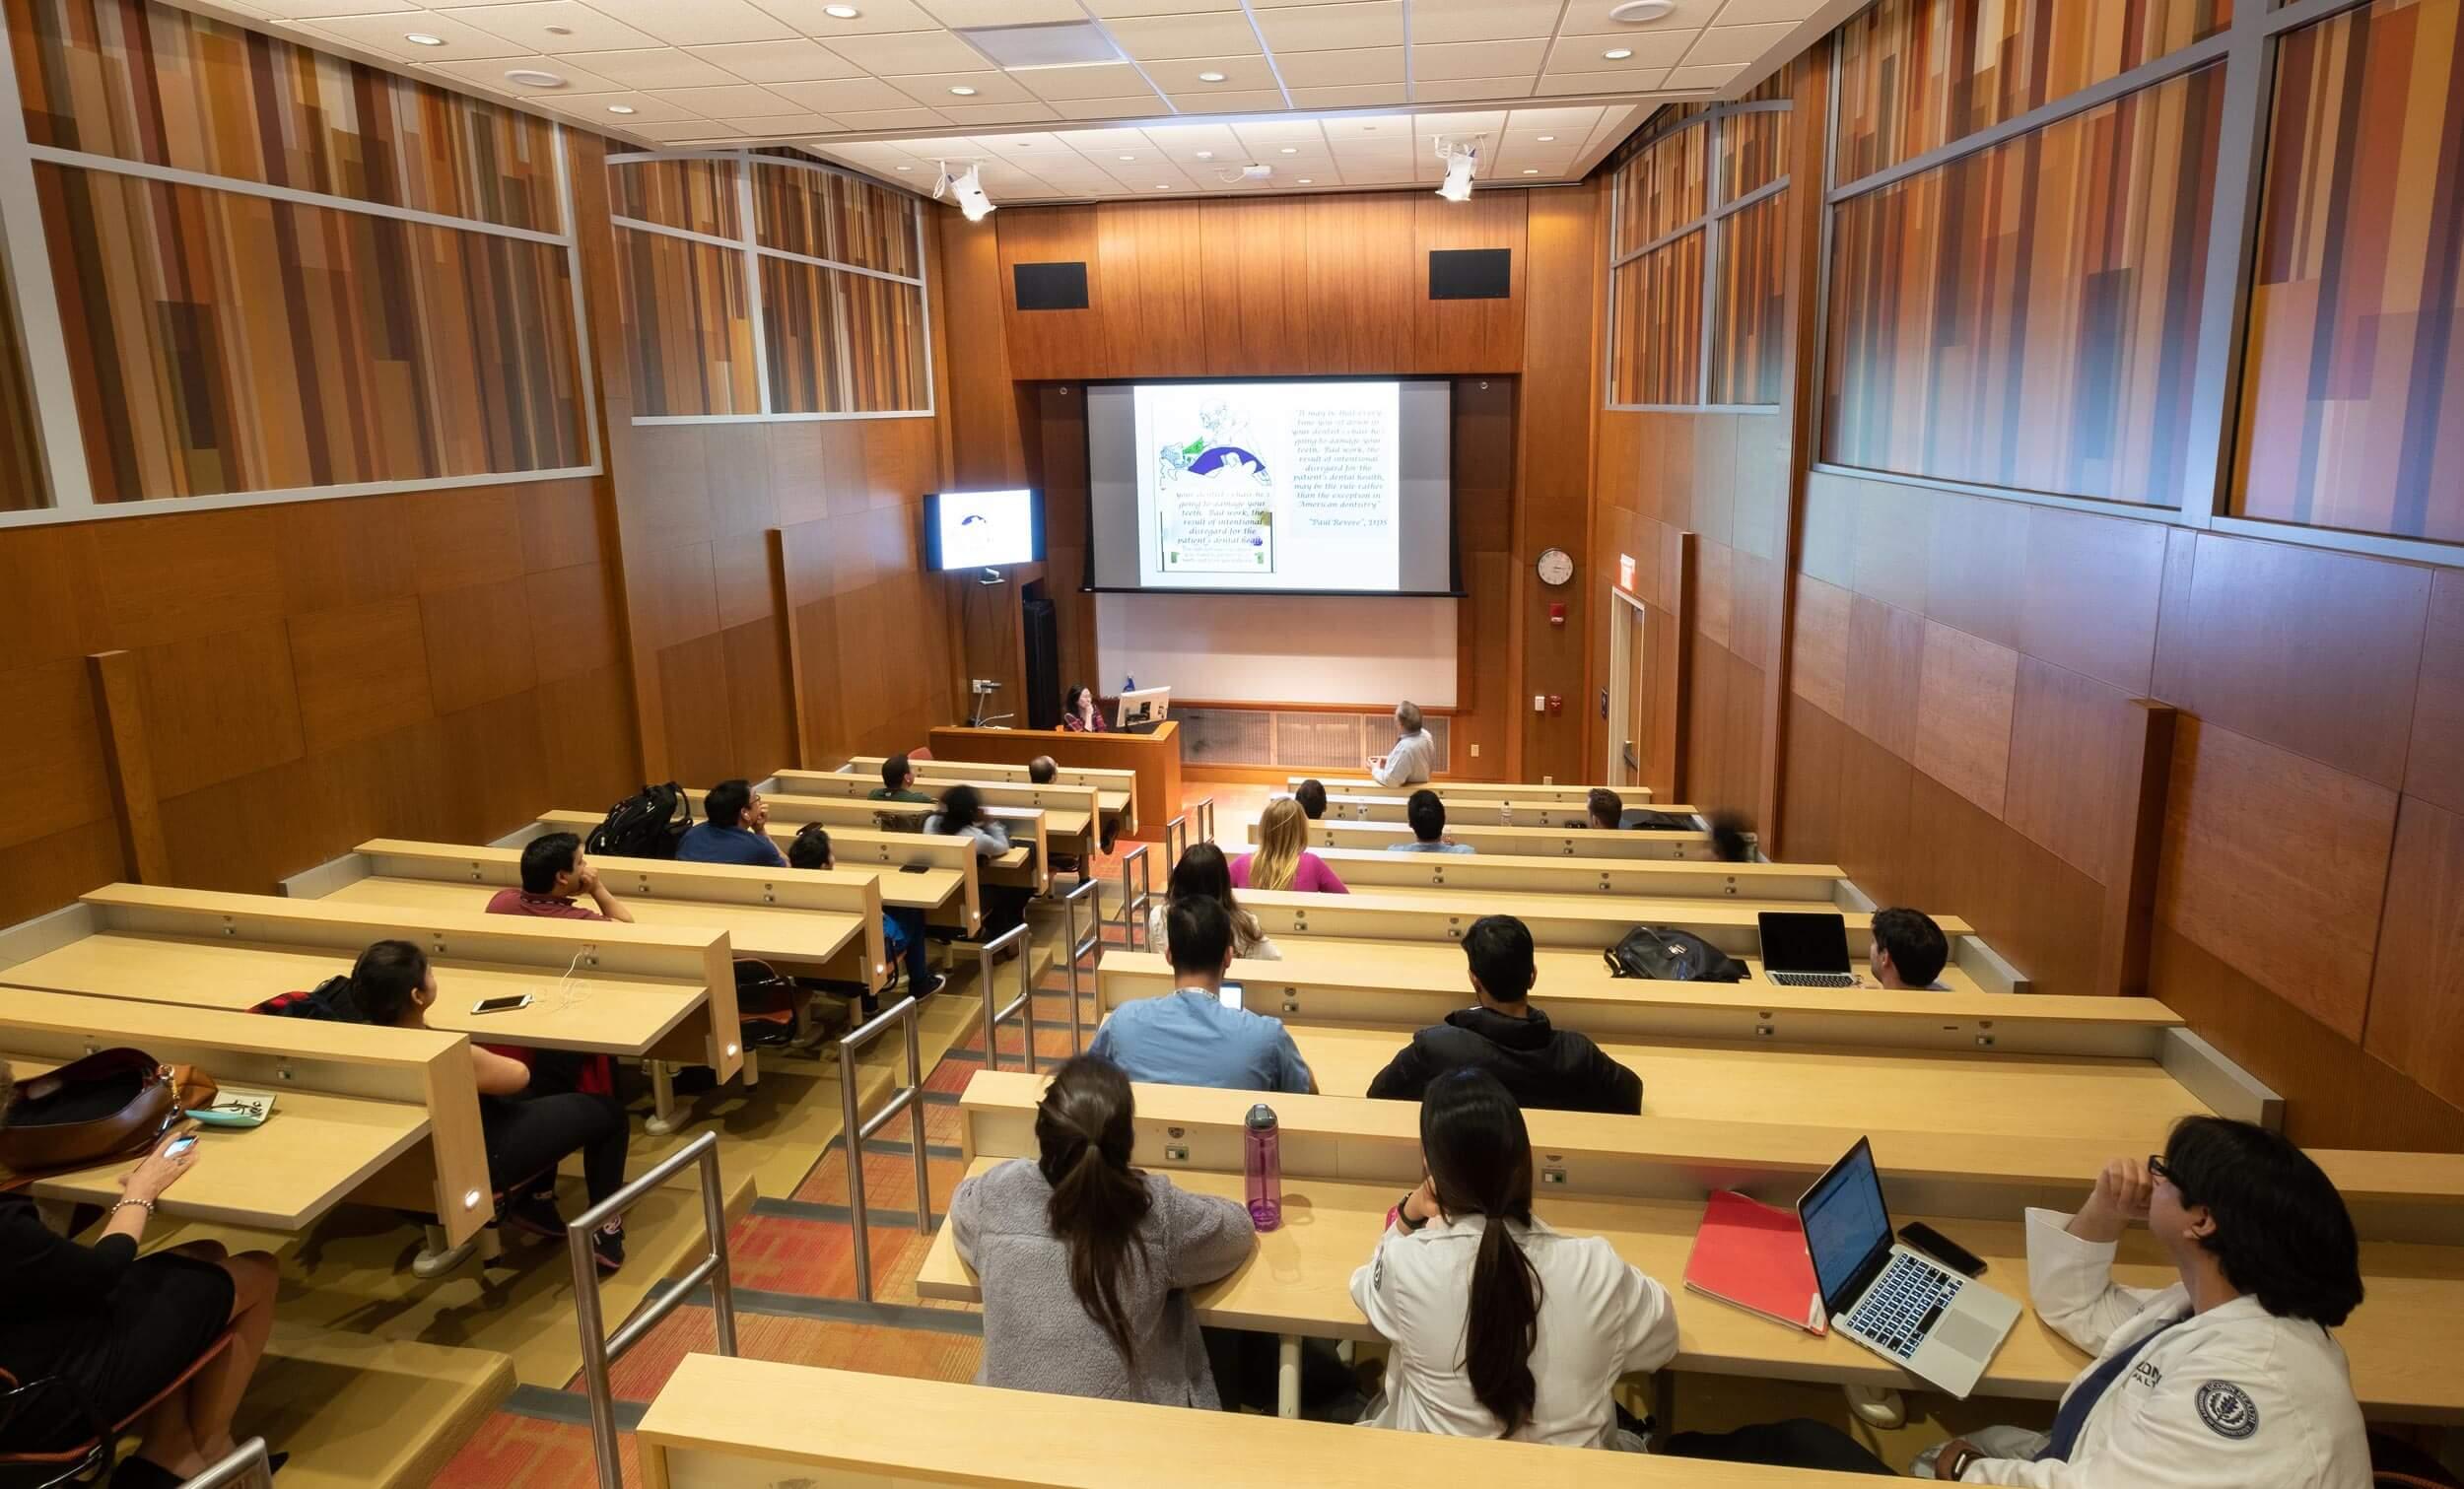 UConn Health / Academic Building Addition